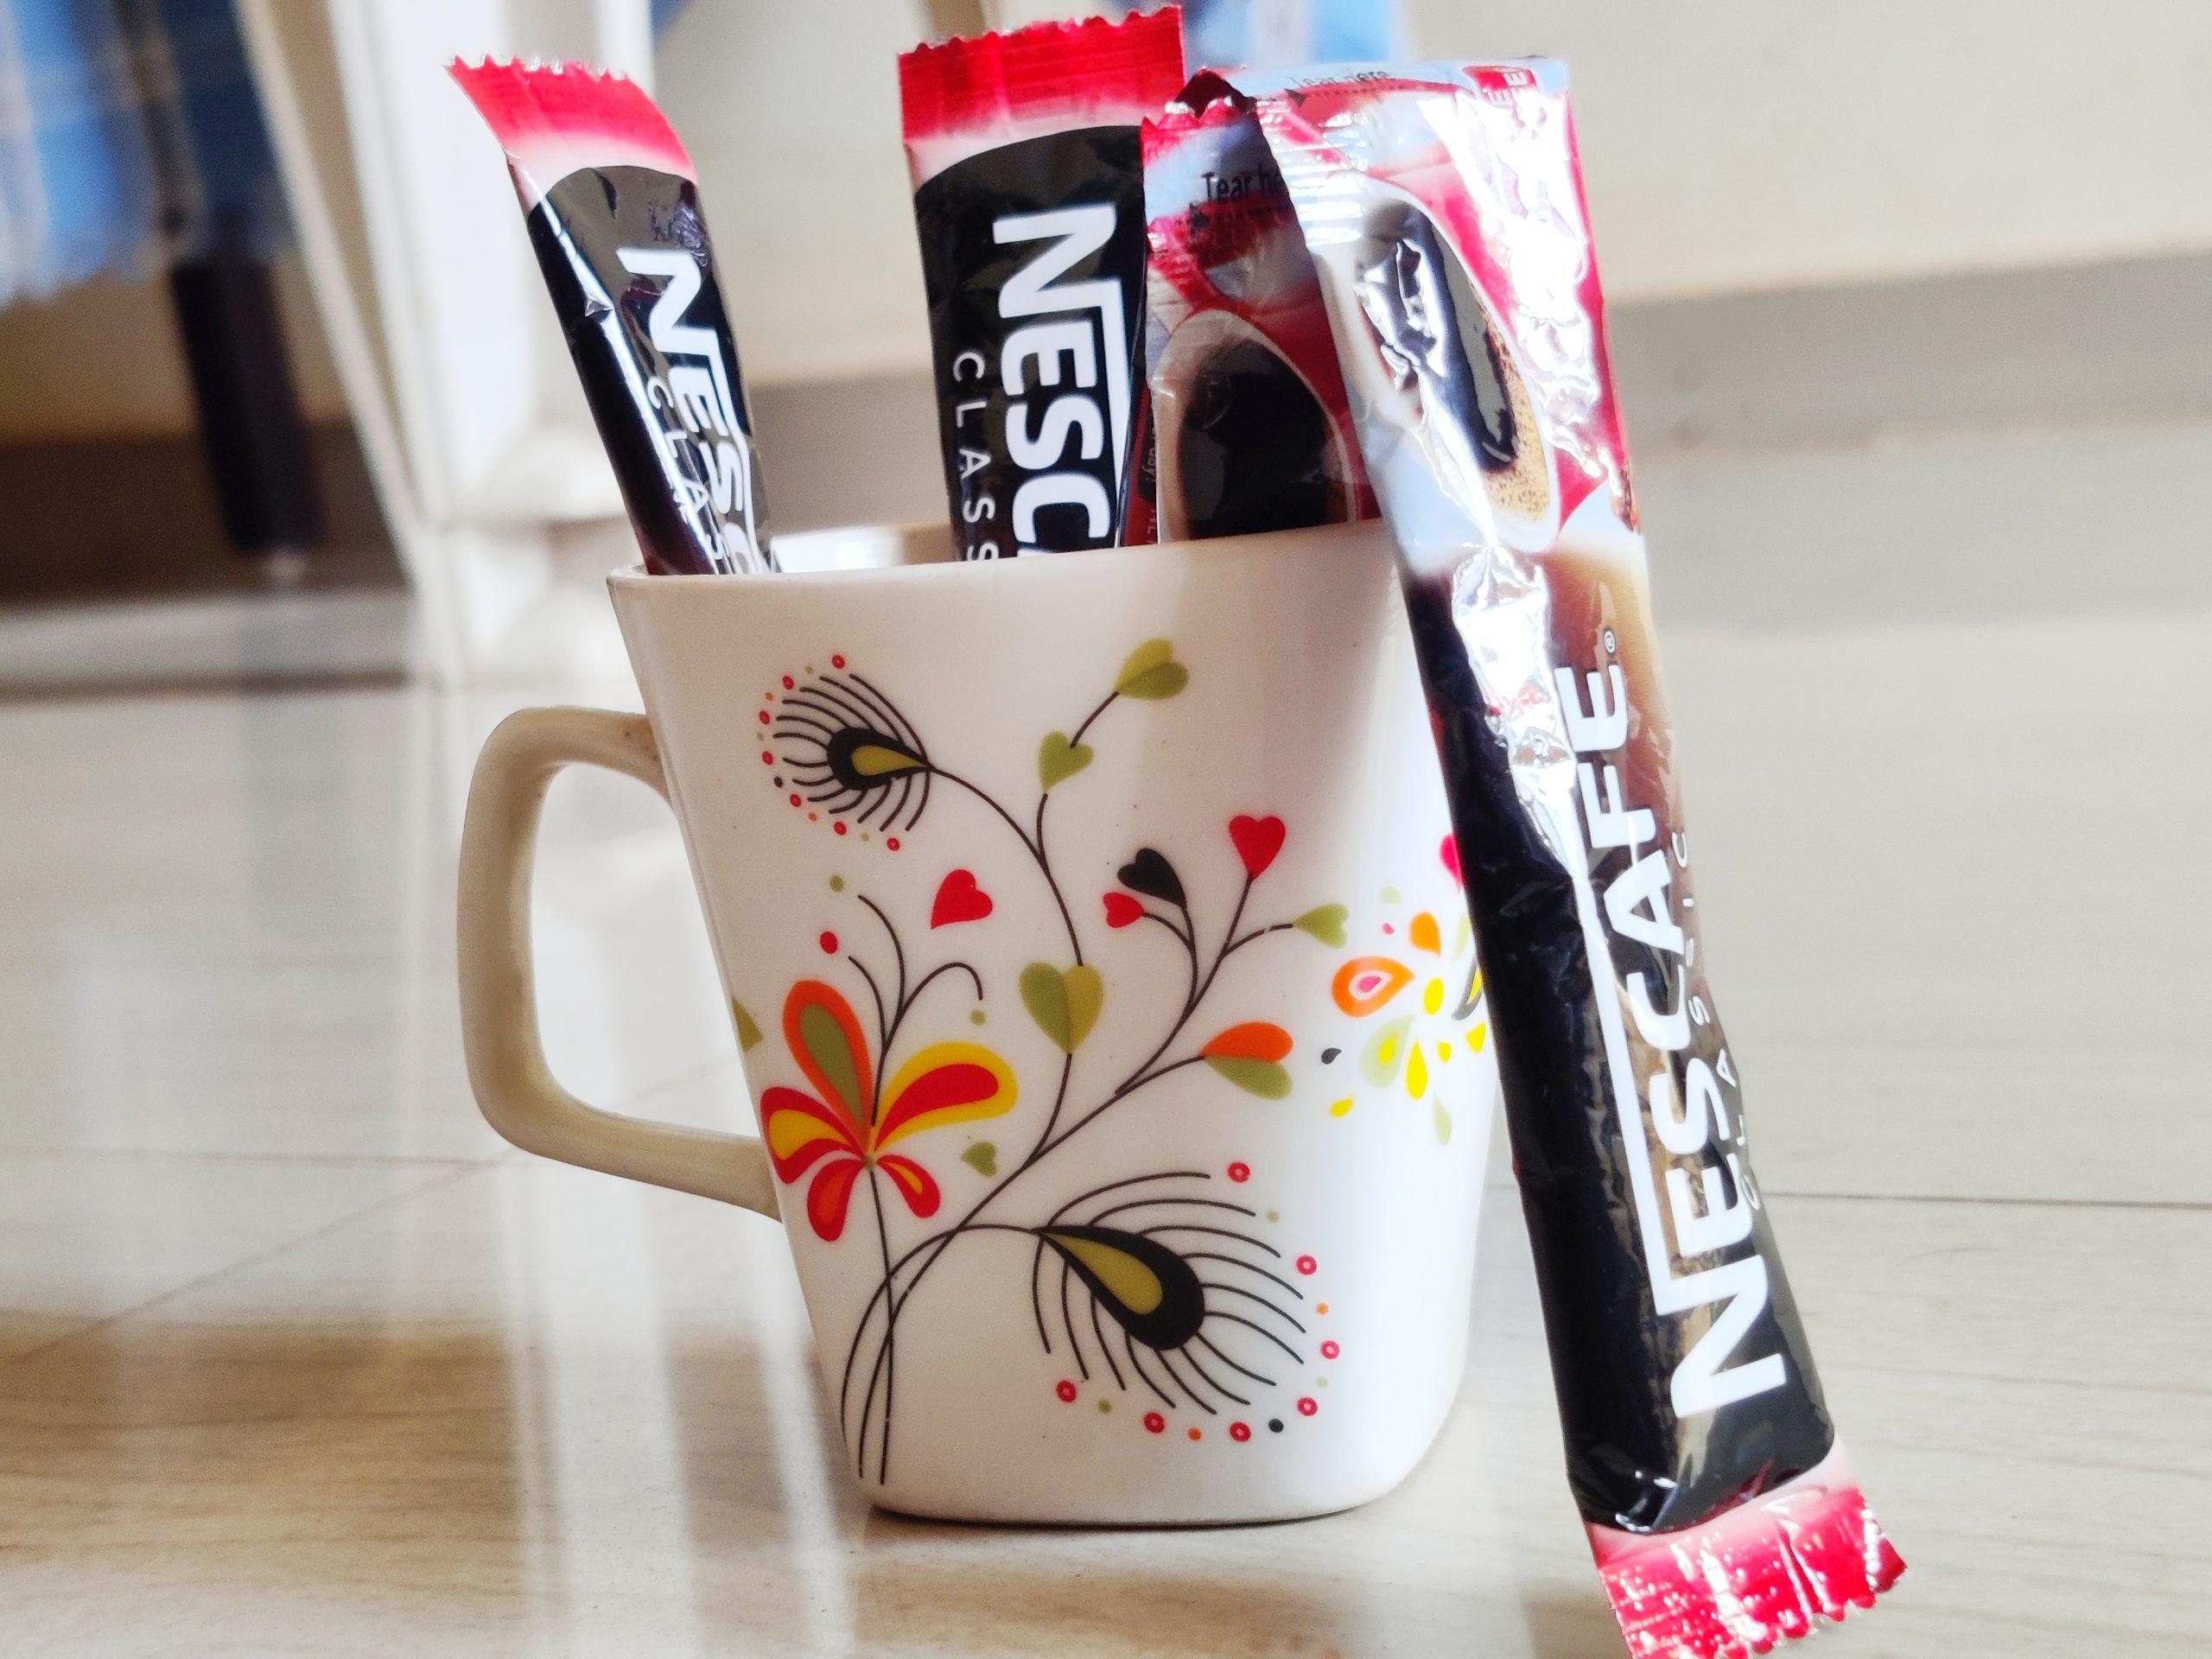 coffee sachets in a mug